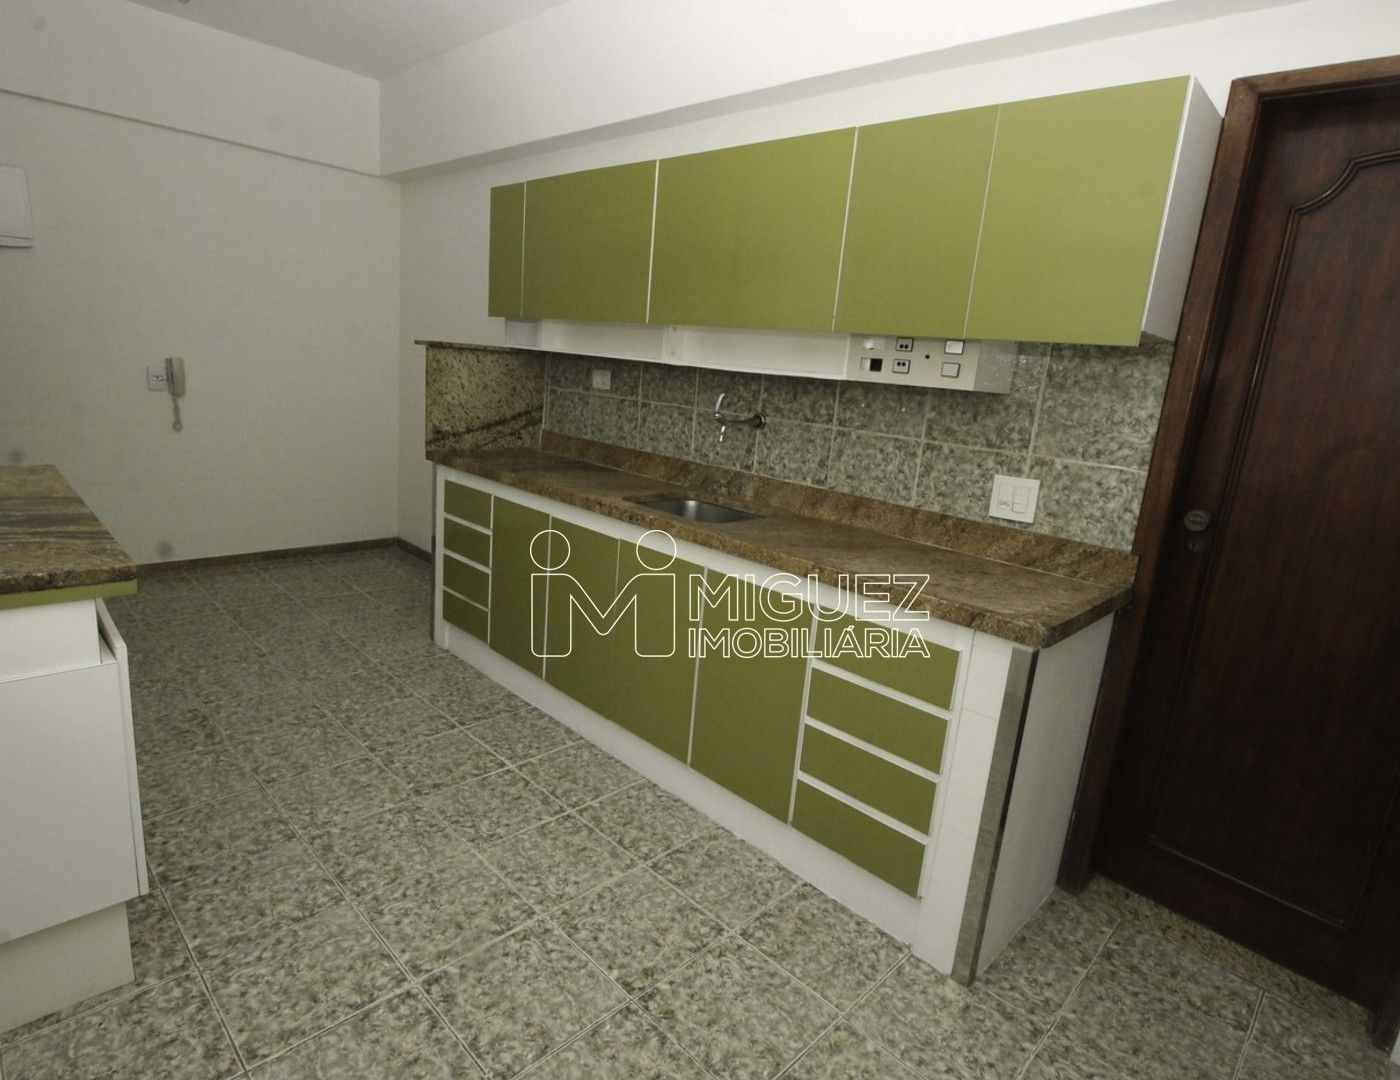 Cobertura, aluguel, Rua Professor Gabiso - Tijuca , Rio de janeiro